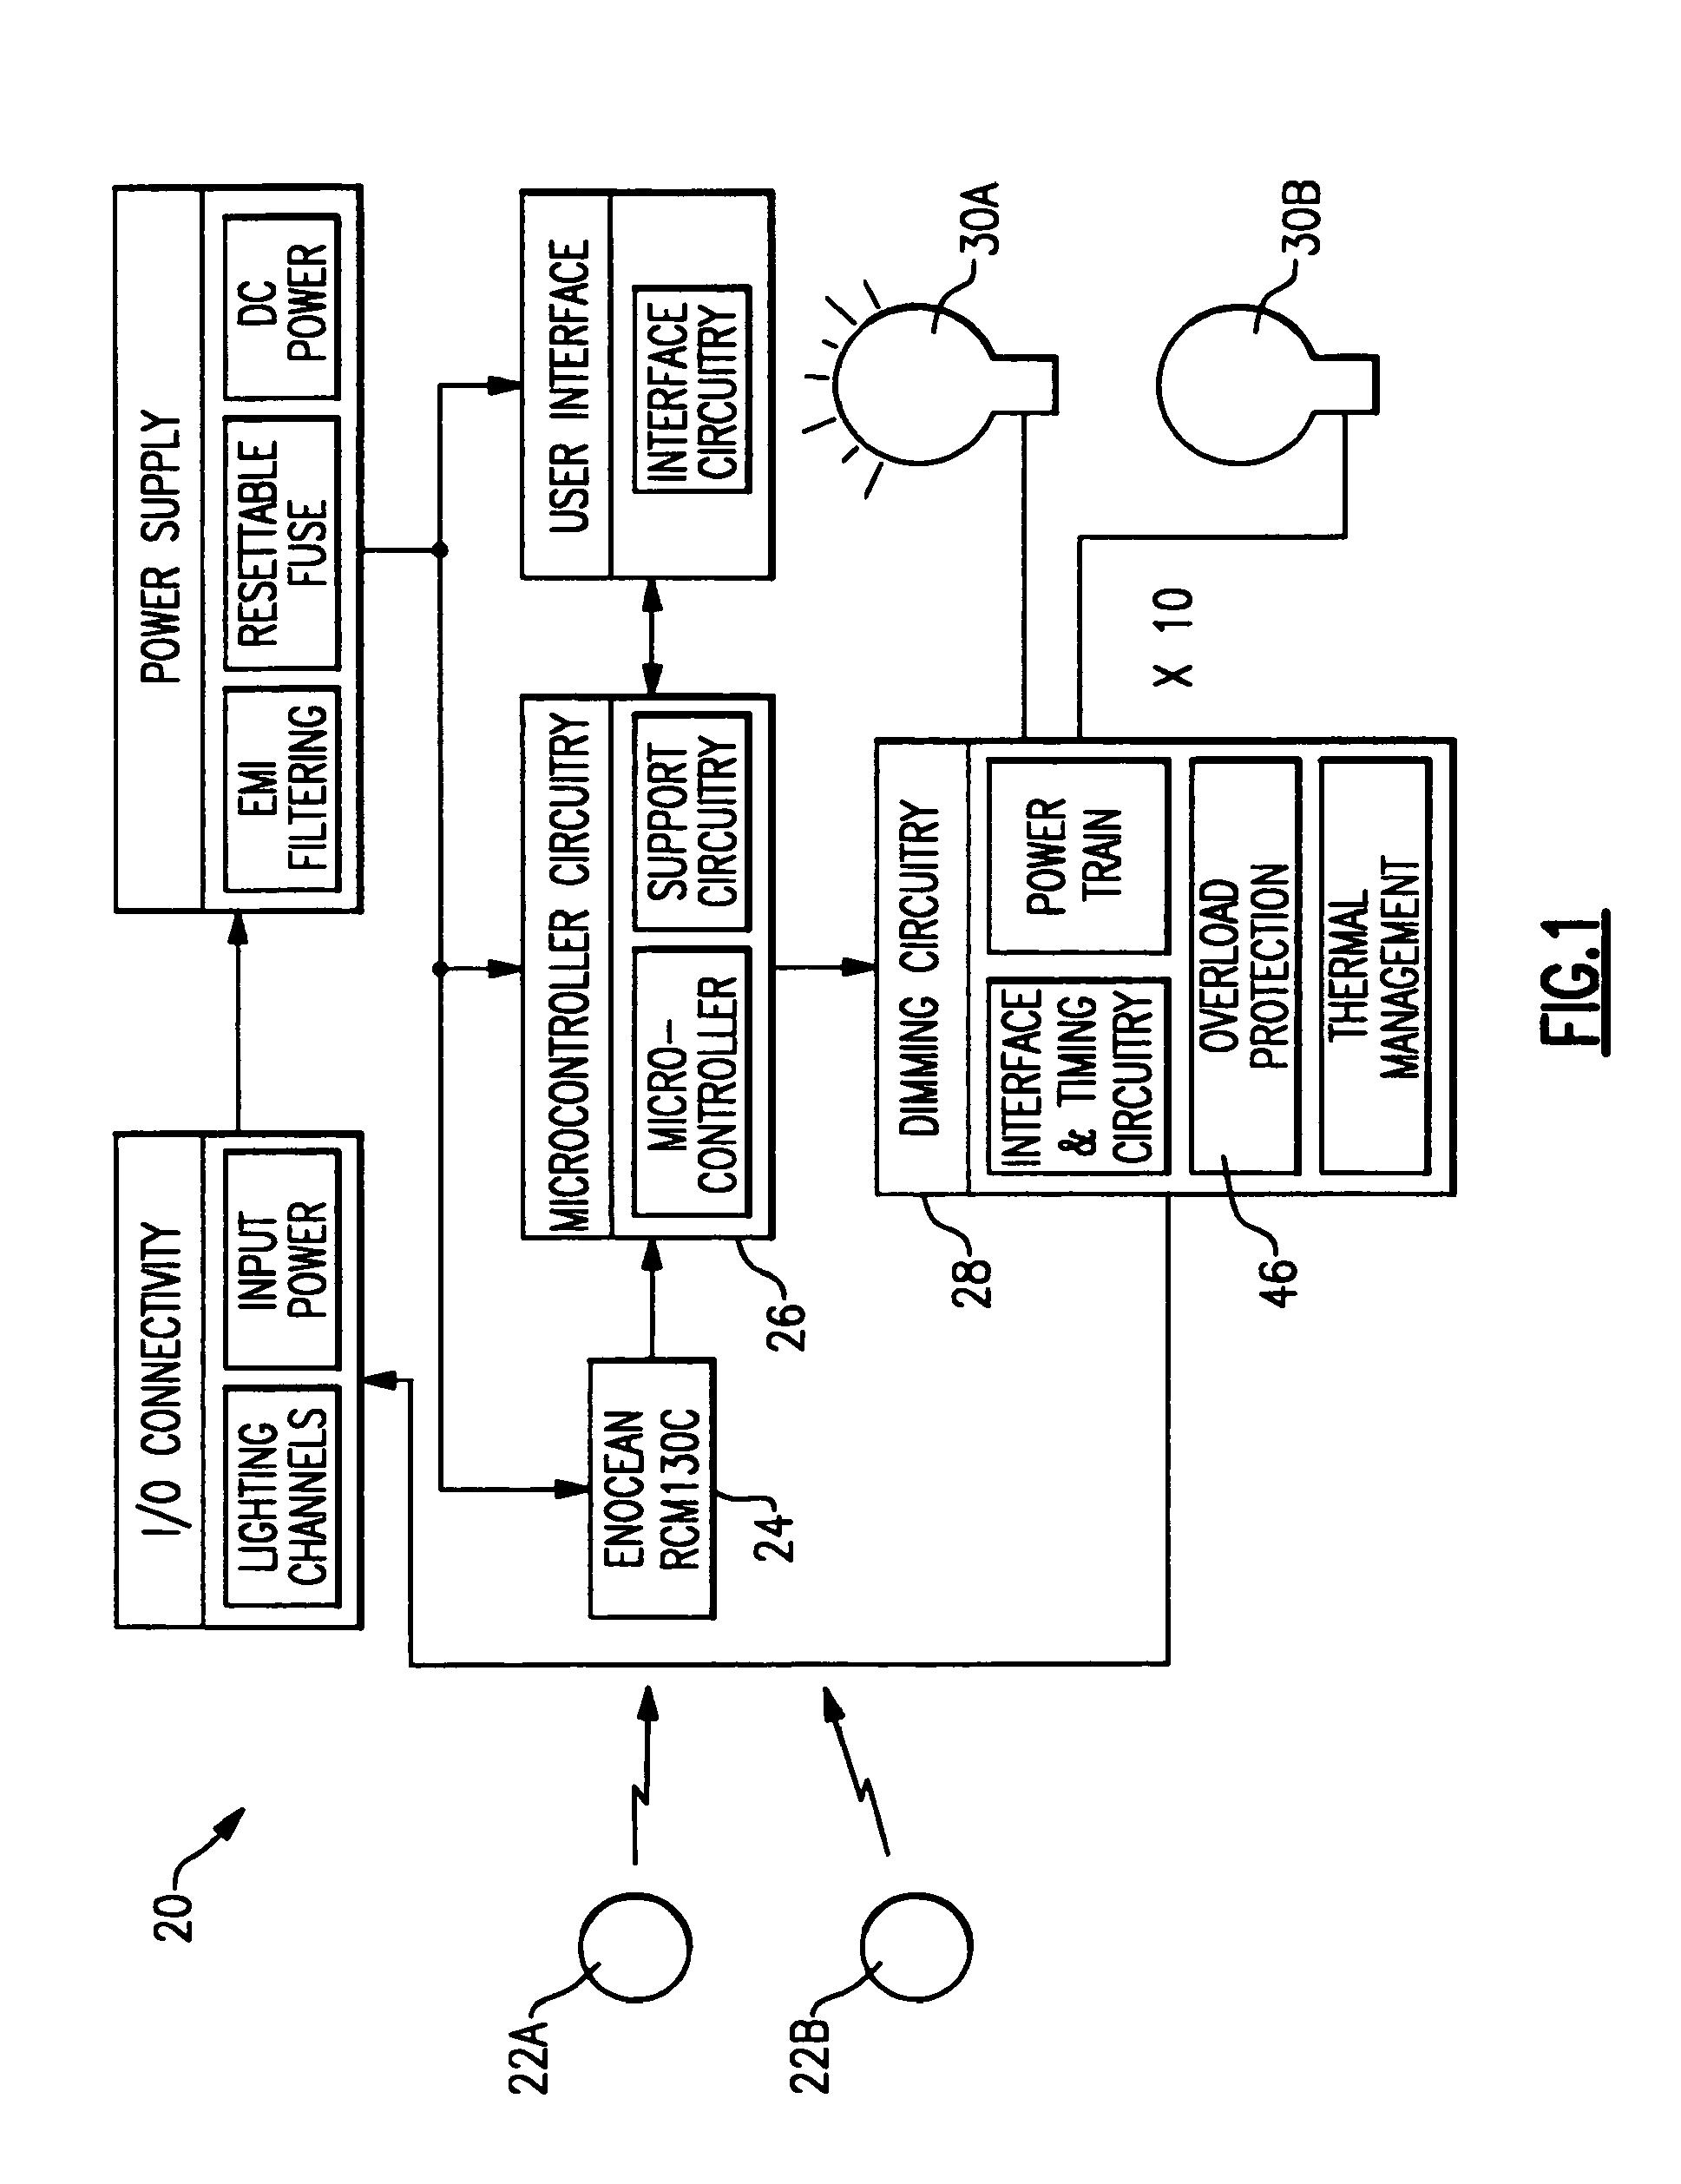 International truck fuse panel diagram